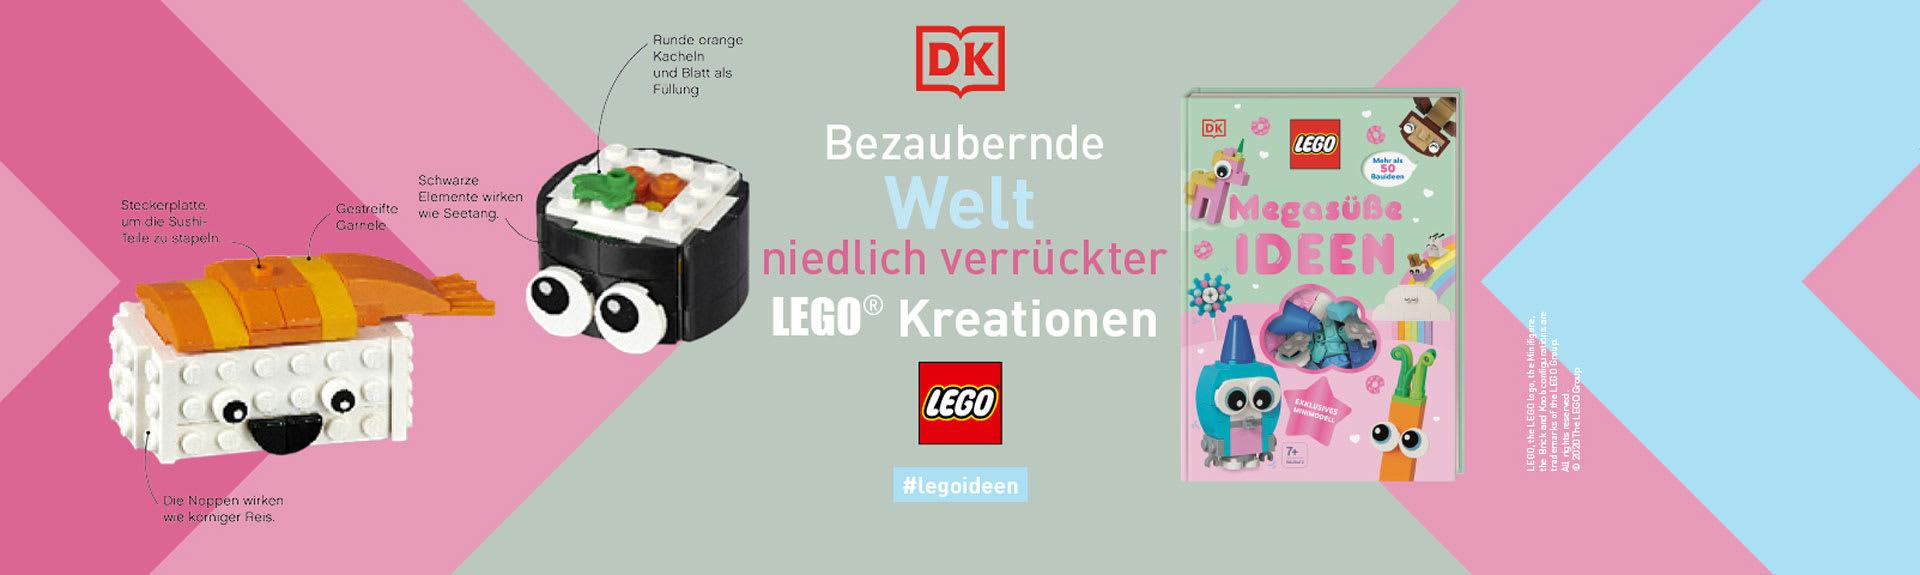 LEGO Megasuesse Ideen